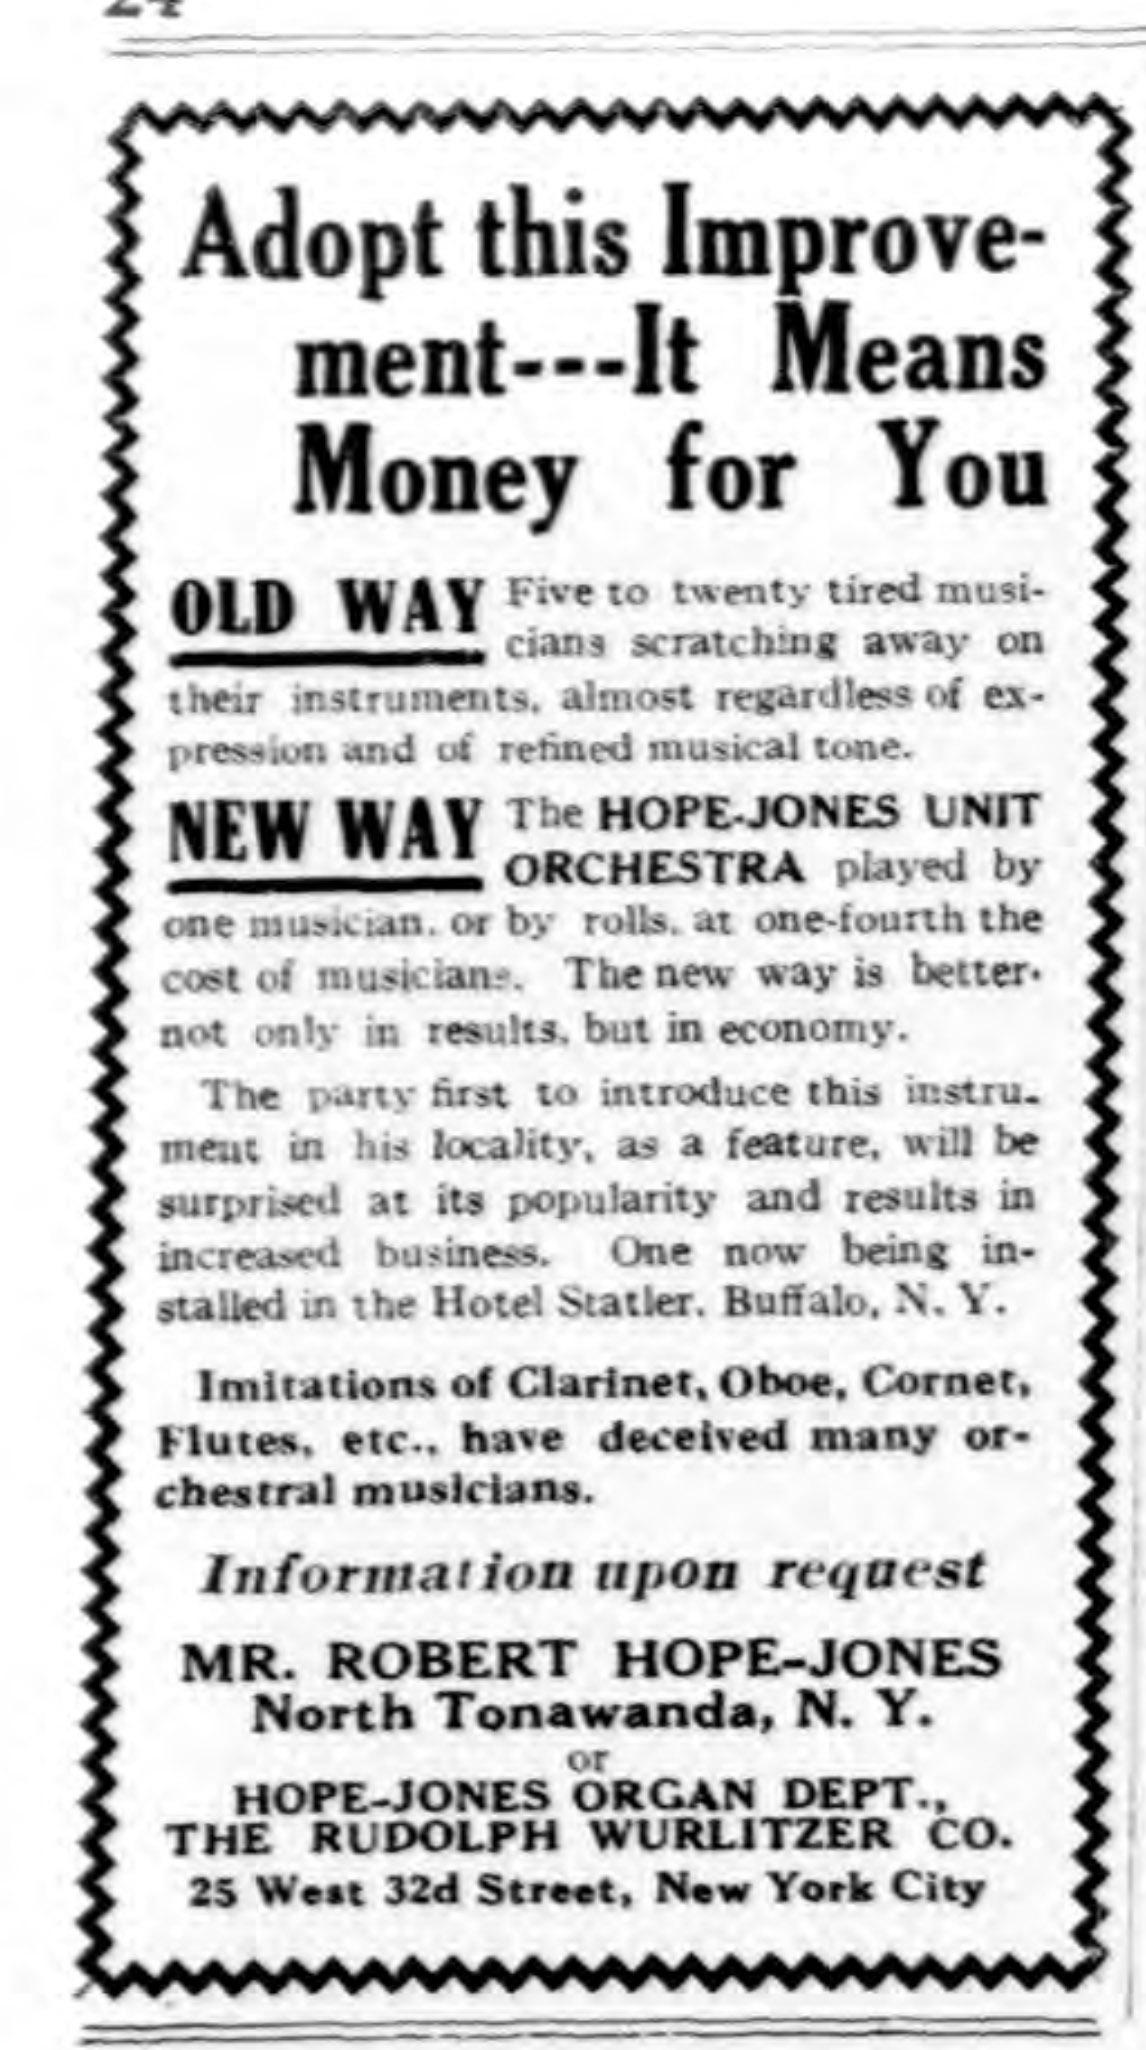 Unit Orchestra, Hope Jones Organ Dept, Wurlitzer, ad (NY Dramatic Mirror, 1910-12-14).jpg